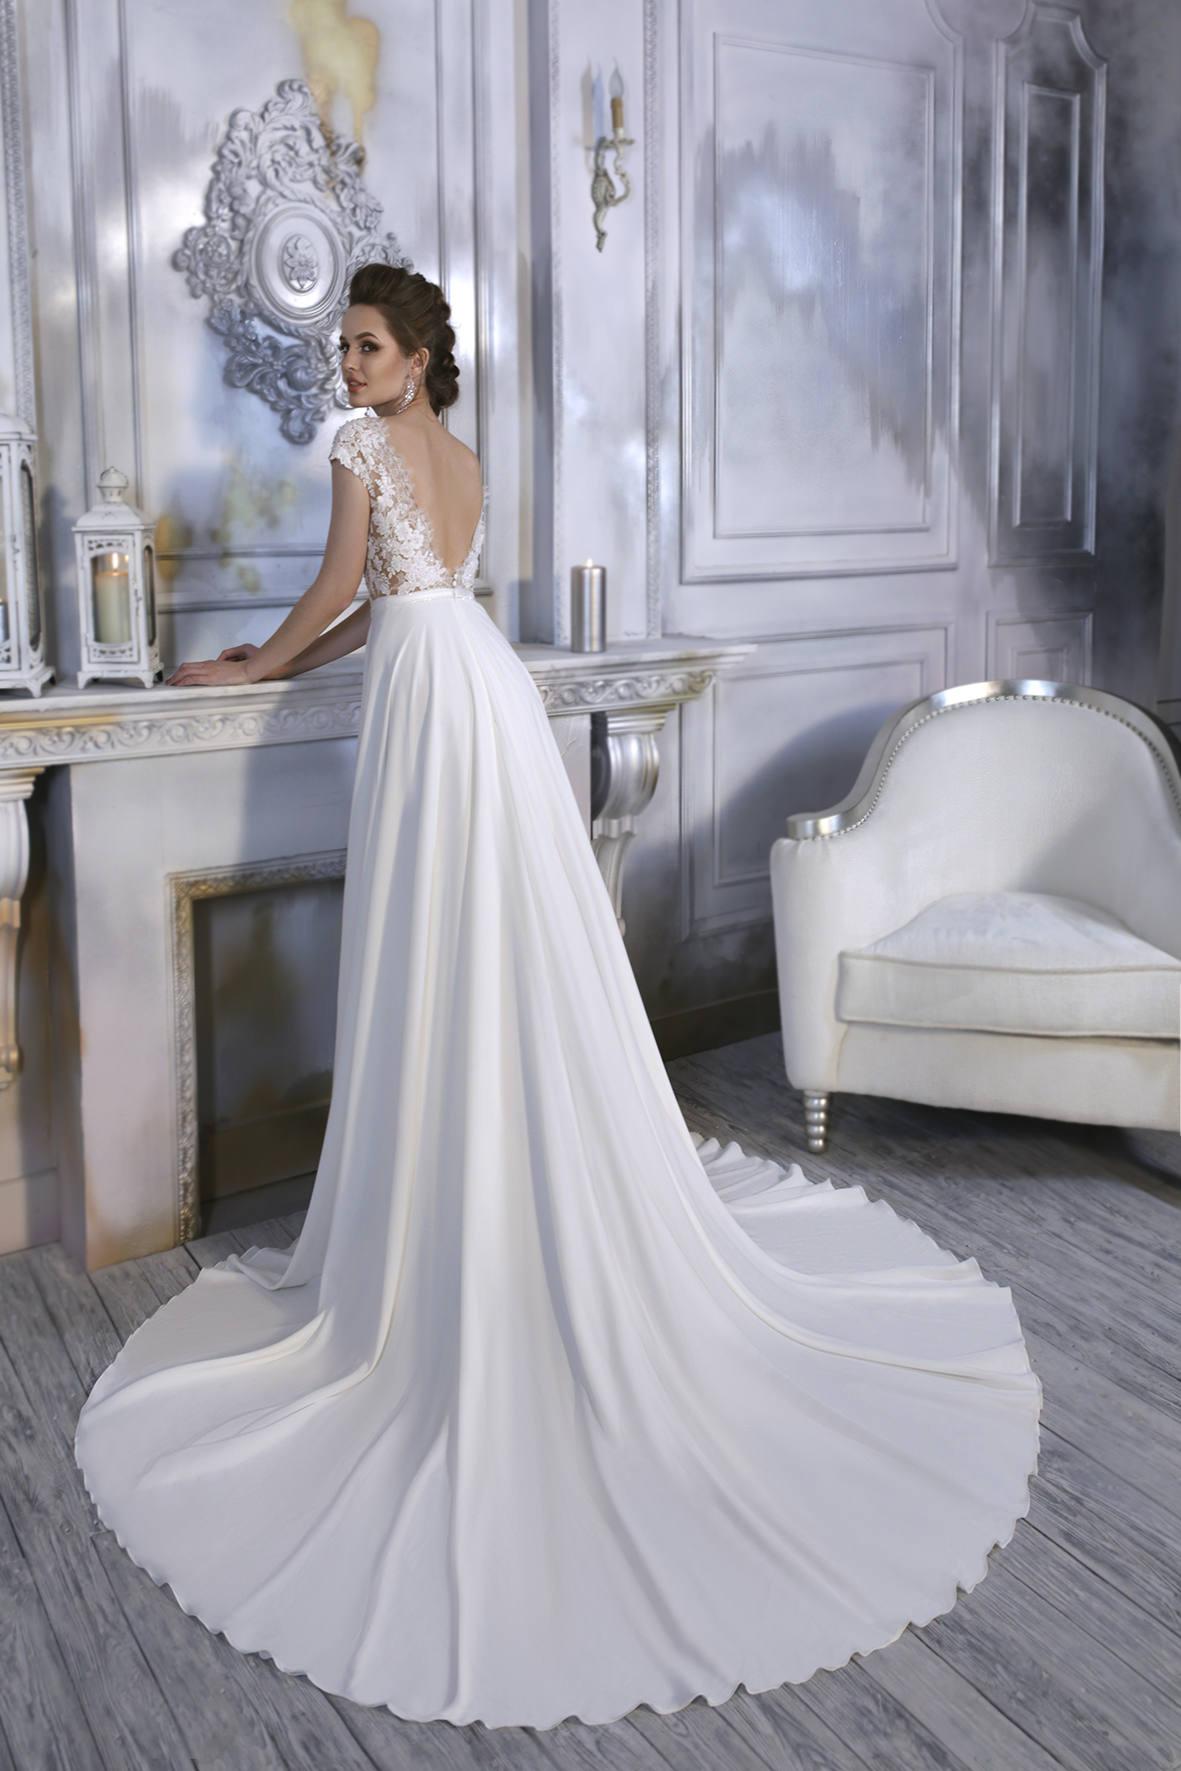 Open Back Wedding Dress - Orsha Wedding Dress - Long Wedding Dress with Train - Simple Lace Dress - Abito da Sposa - Sexy Wedding Dress.jpg